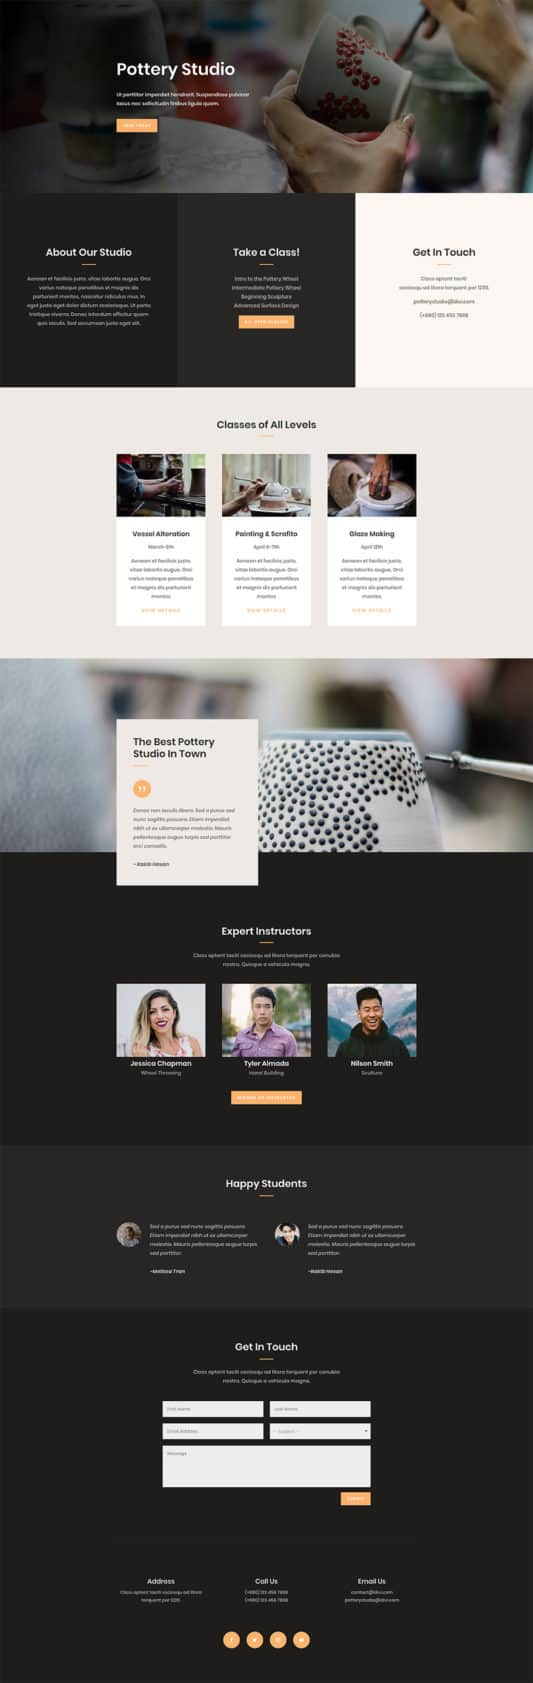 Pottery Studio Web Design 7